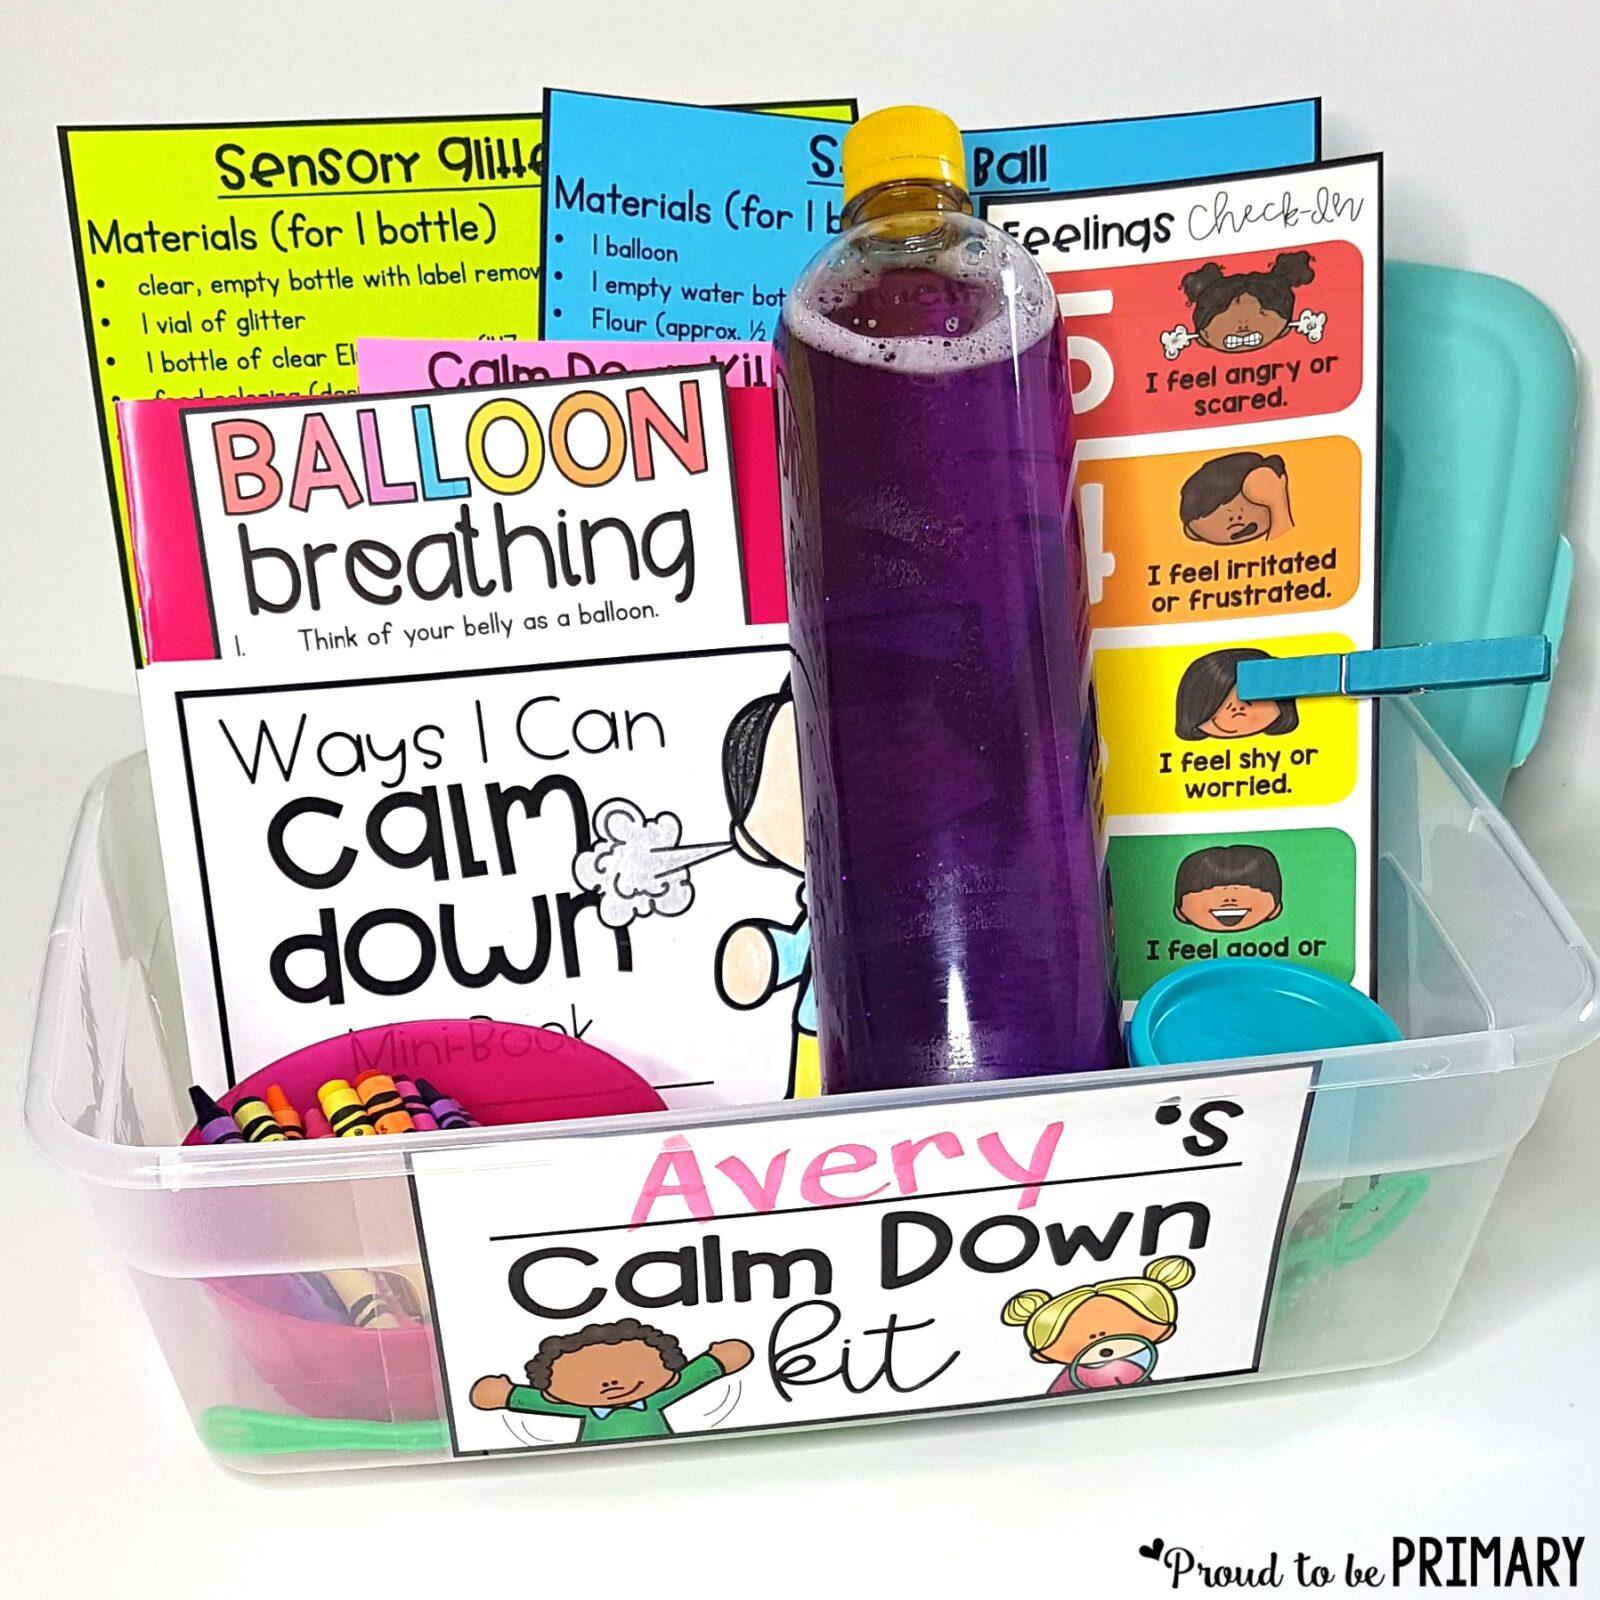 self-regulation strategies - calm kit used to help kids self-regulate their emotions